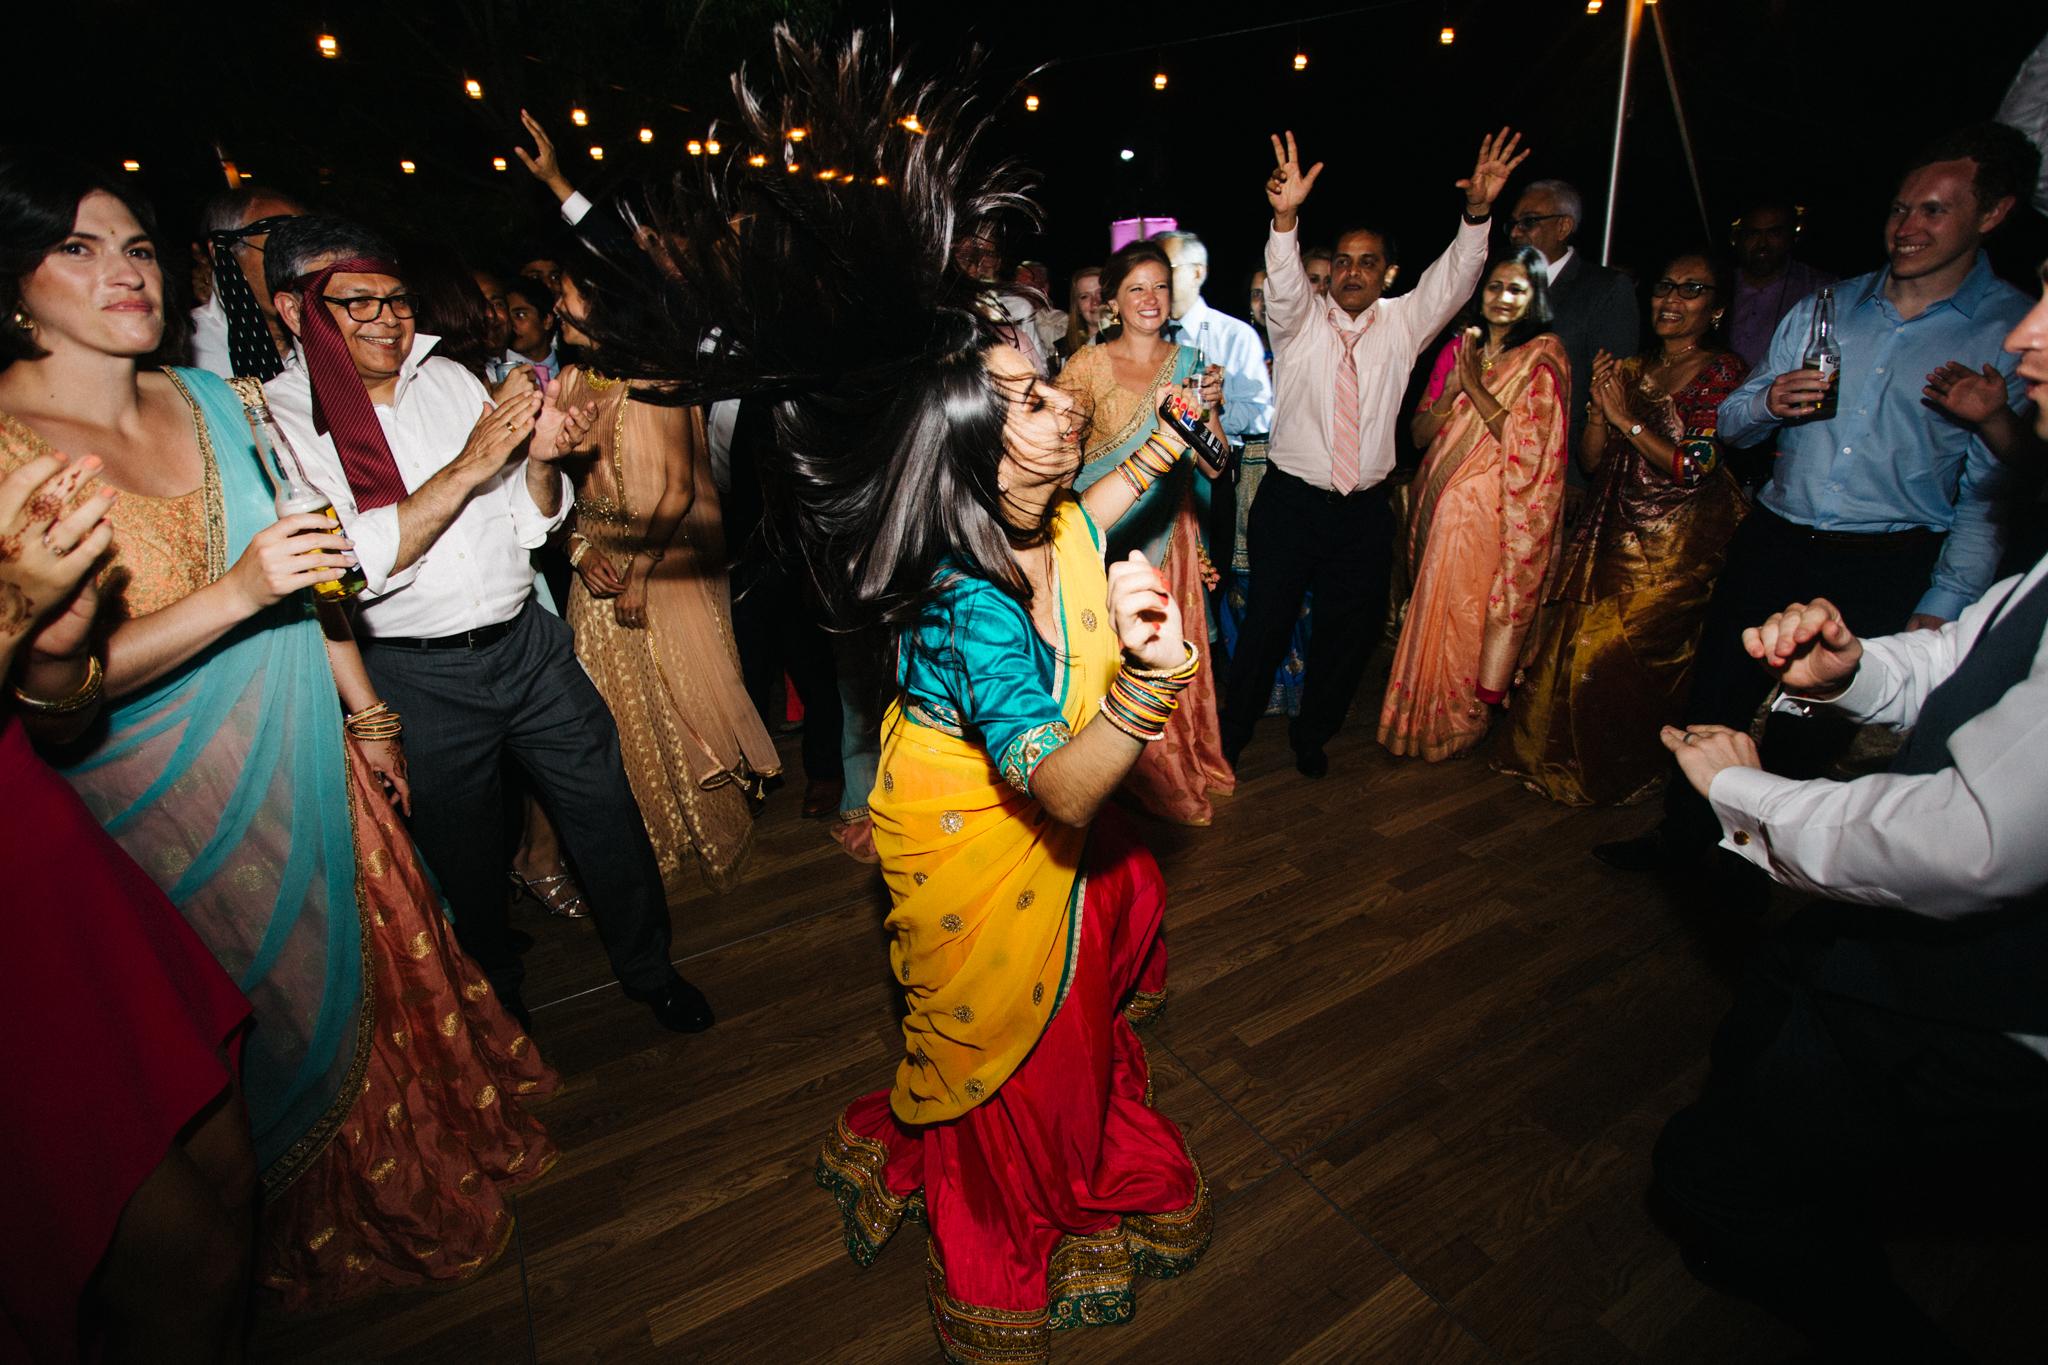 indian-wedding_02.jpg